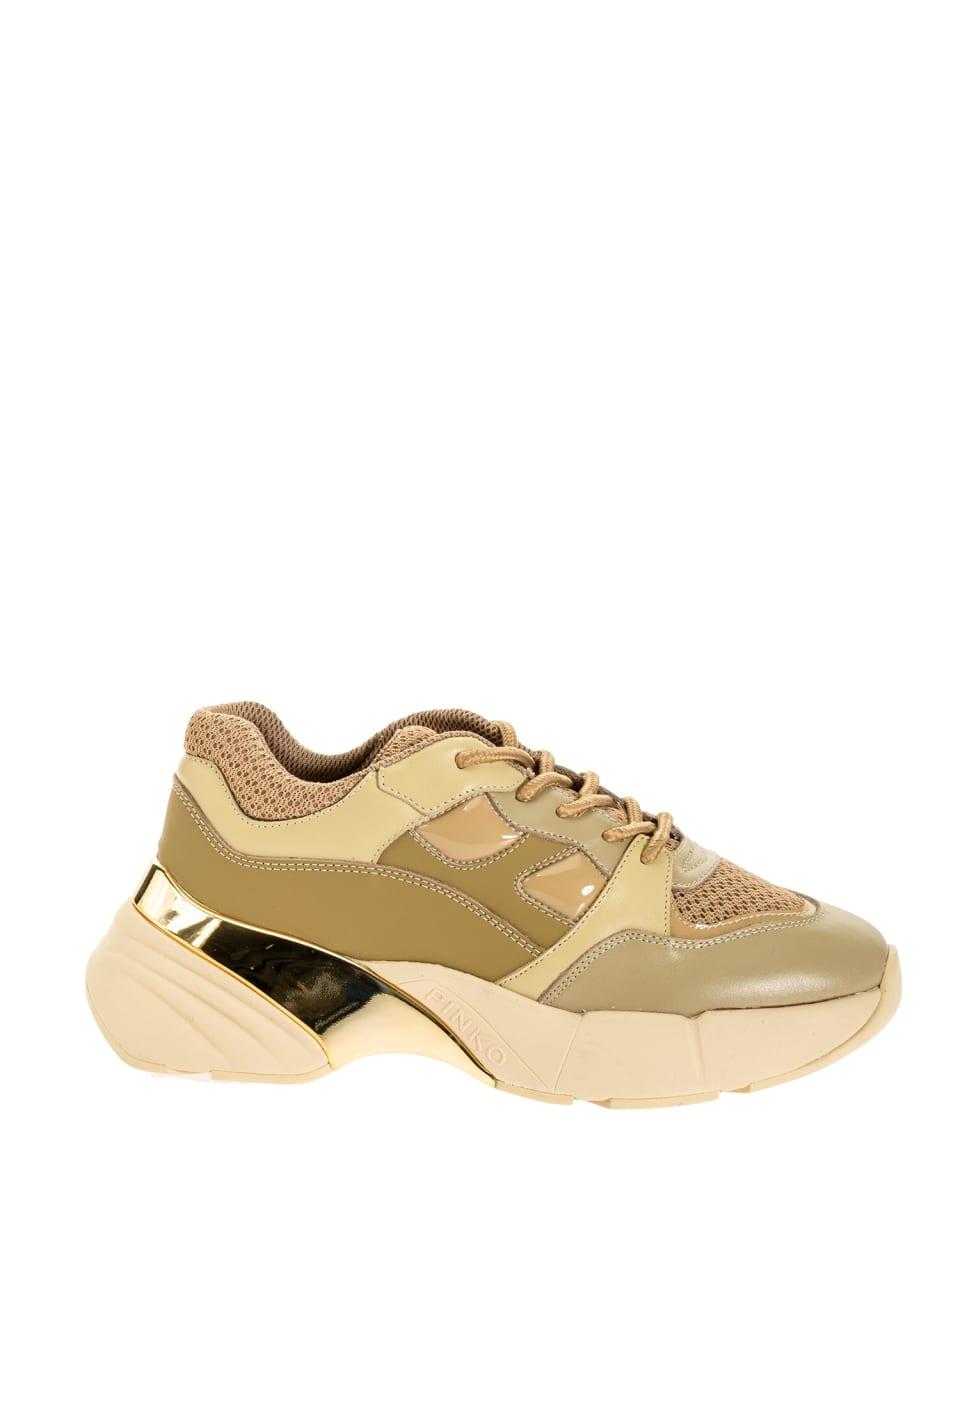 Einfarbige Oversize-Sneakers - Pinko